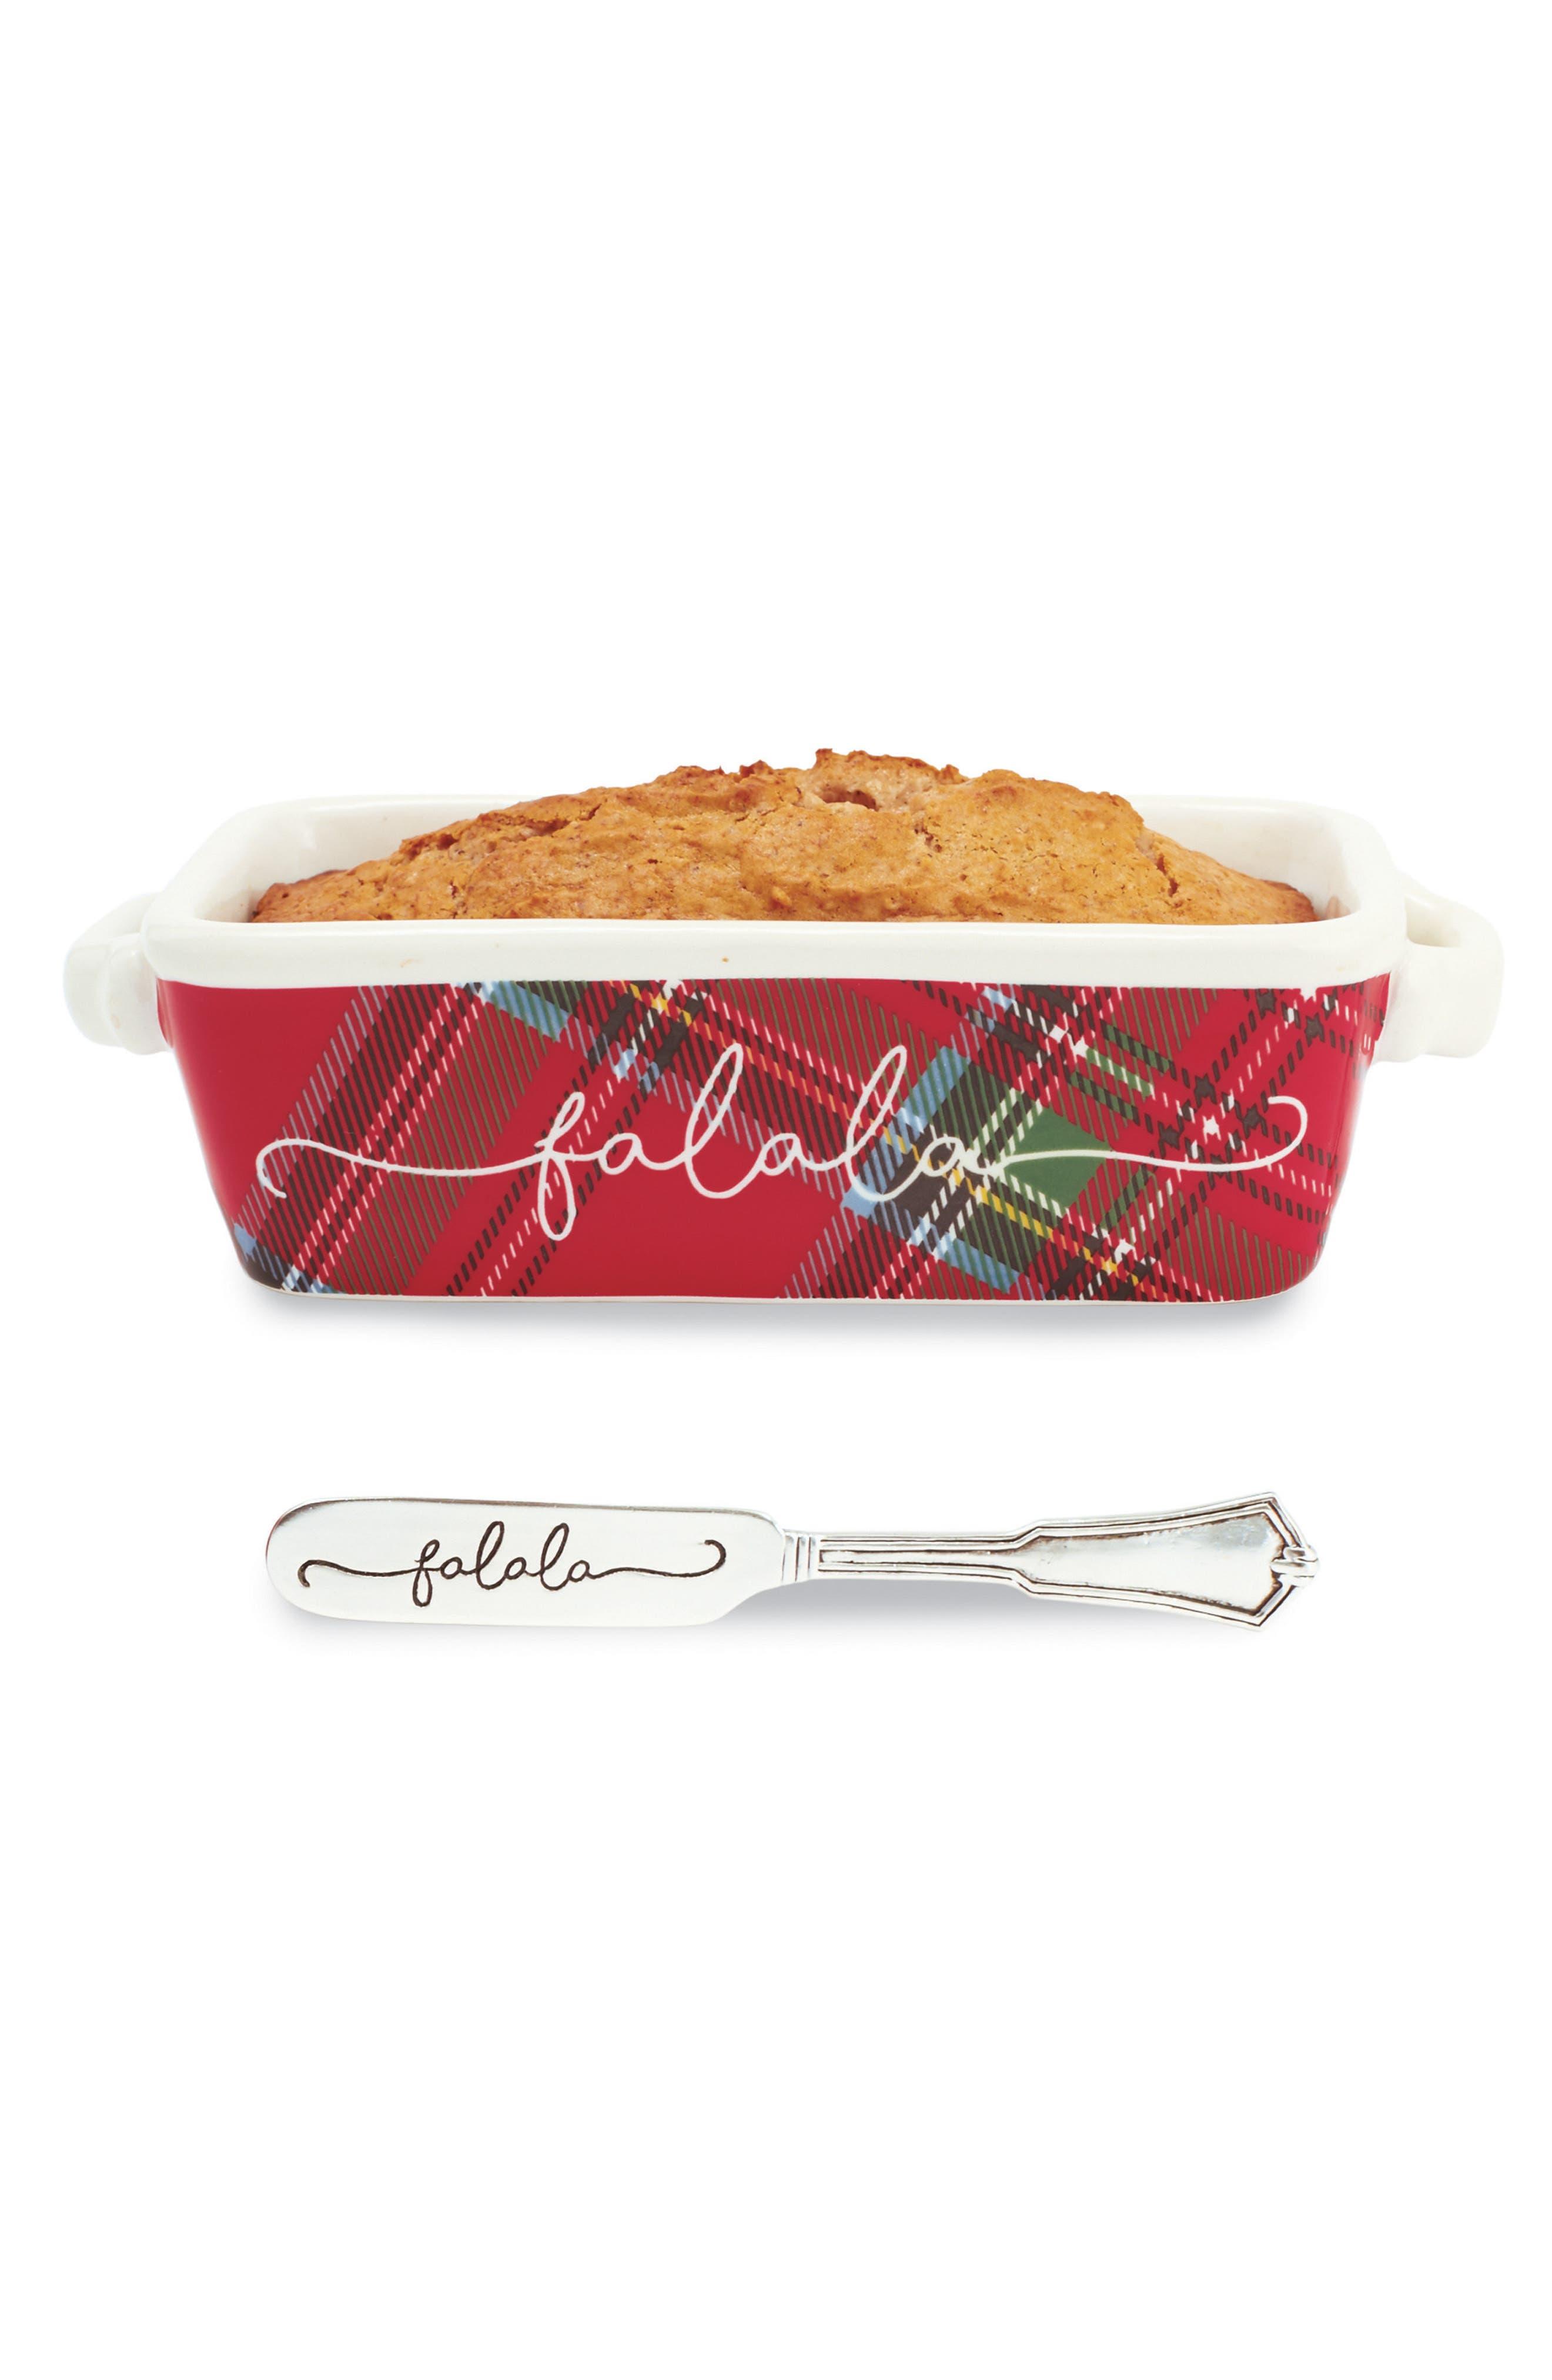 Fa La La Tartan Ceramic Mini Loaf Pan & Spreader,                             Main thumbnail 1, color,